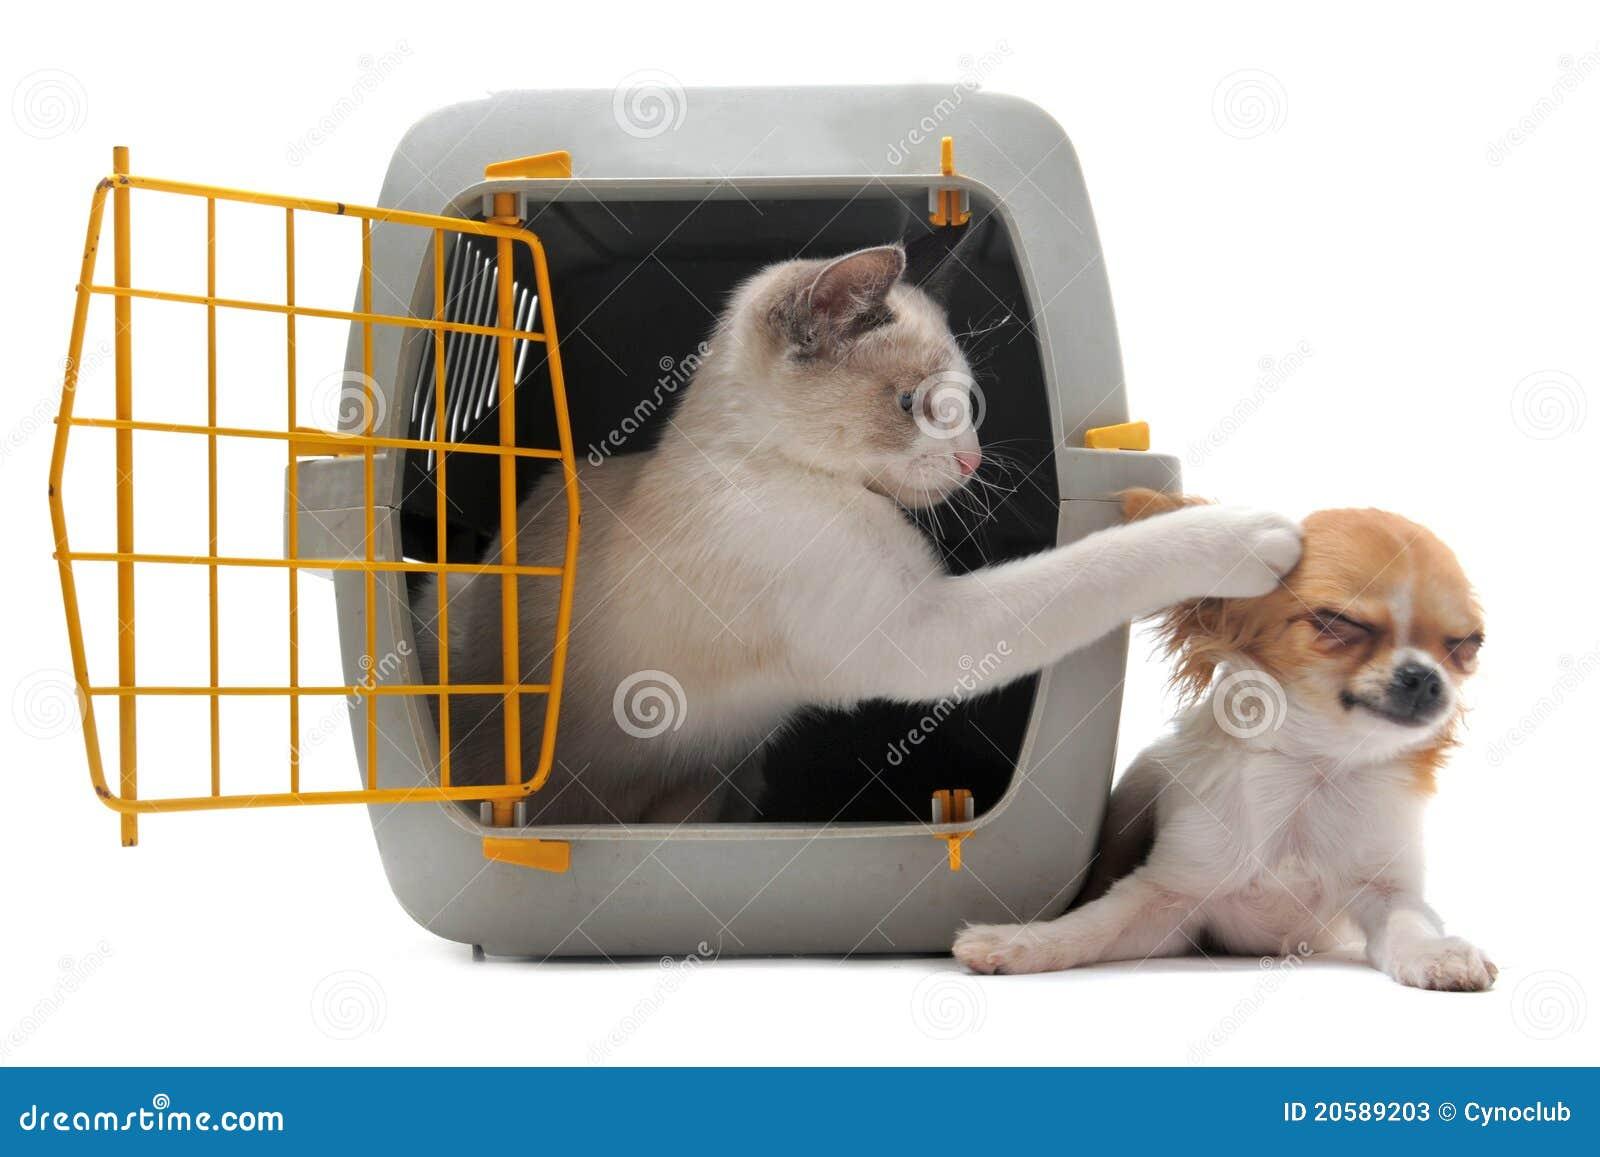 狗和人�y�'��)�al�����:)�h�_承运人奇瓦瓦狗小猫宠物